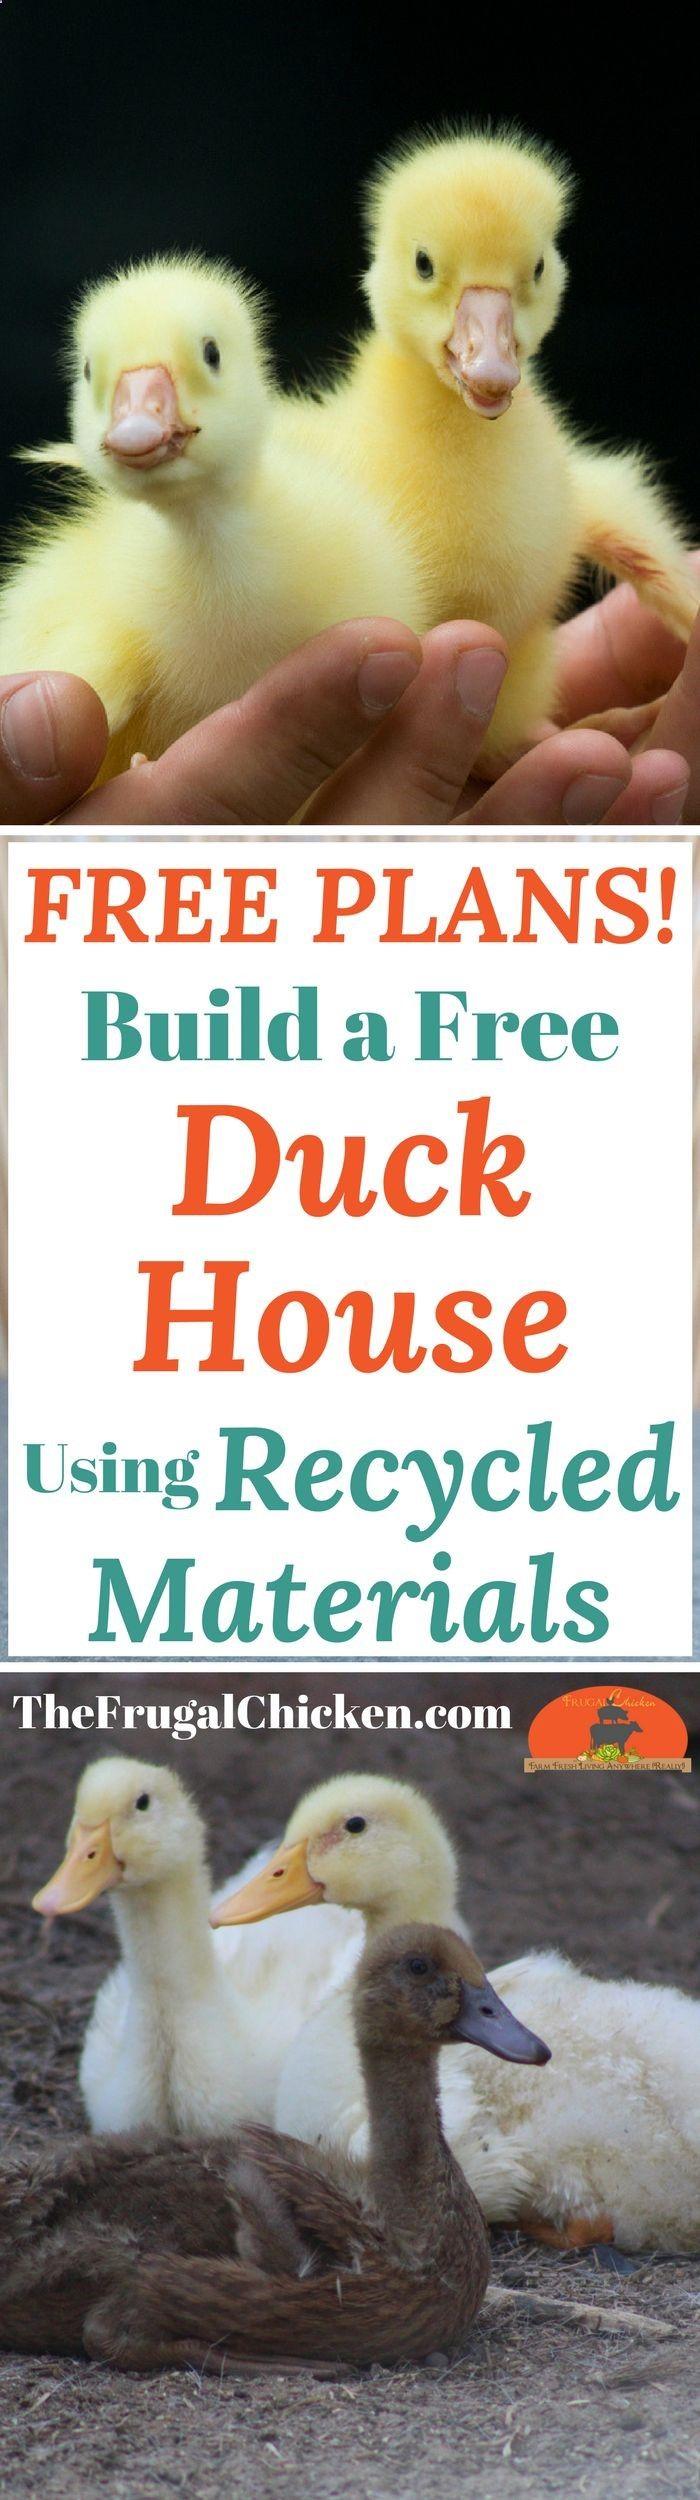 25 Best Ideas About Duck House Plans On Pinterest Duck